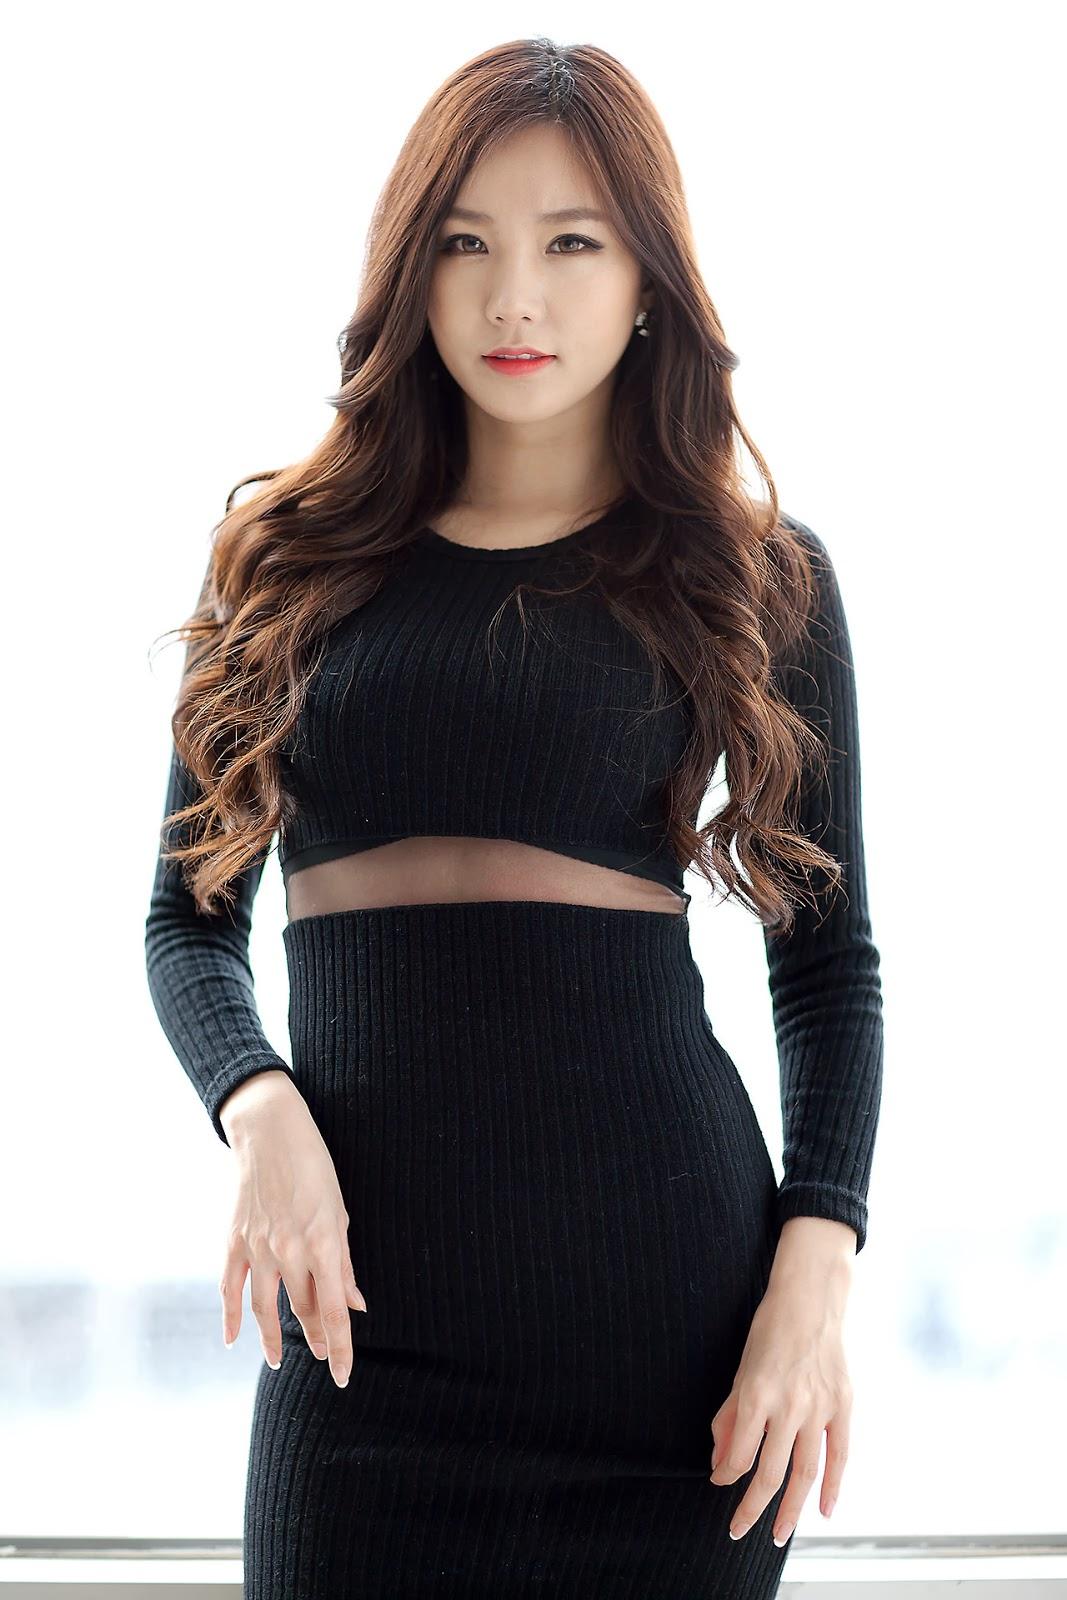 Lee Ji Min - Gorgeous Beauty